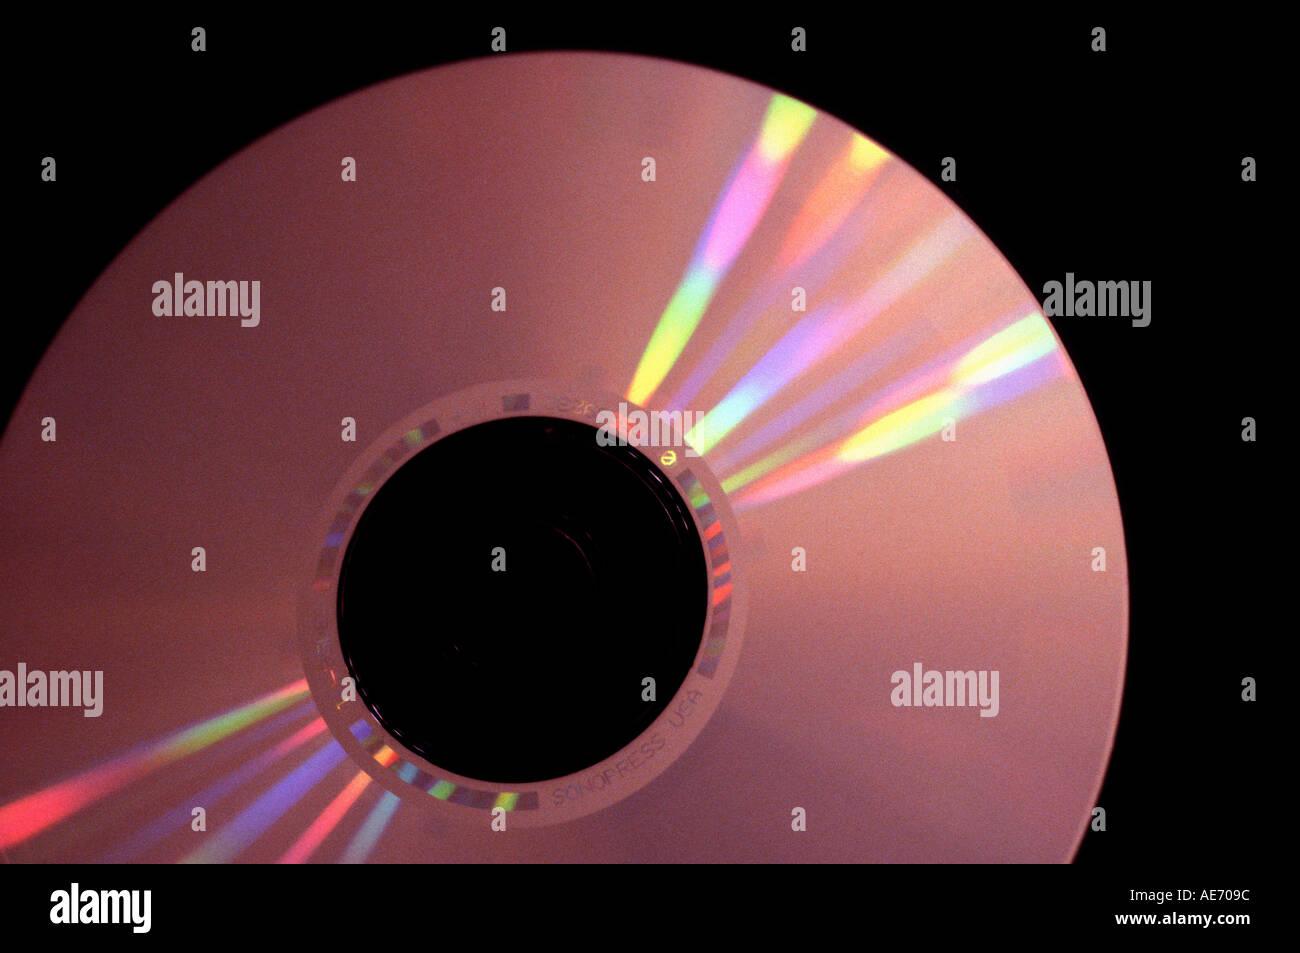 CD DVD 1 - Stock Image